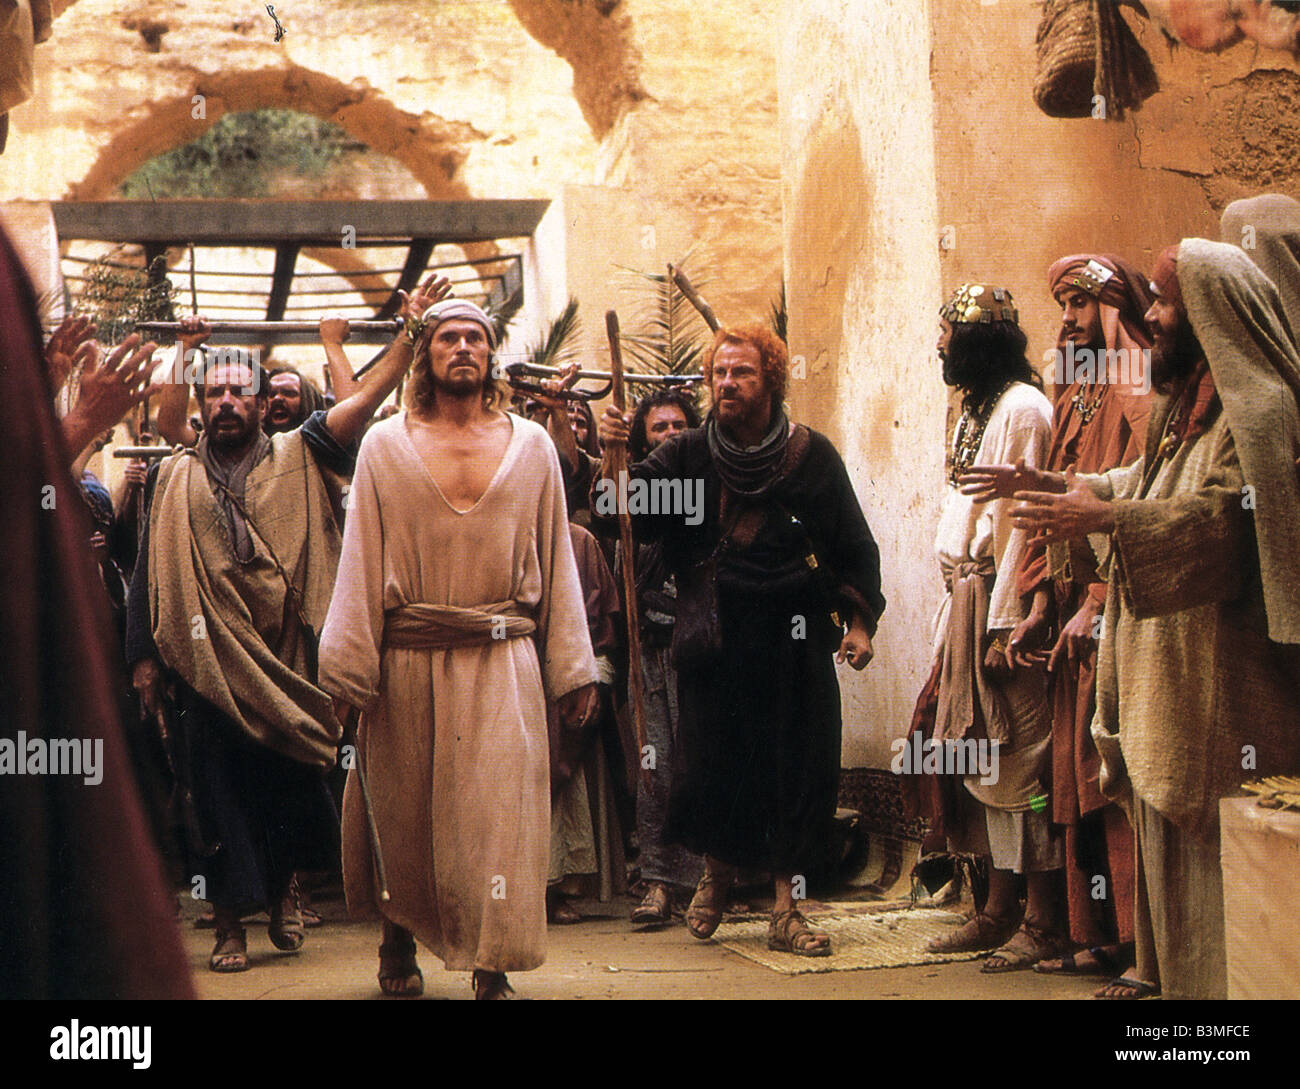 THE LAST TEMPTATION OF CHRIST 1988 Universal Film With Willem Dafoe As Jesus